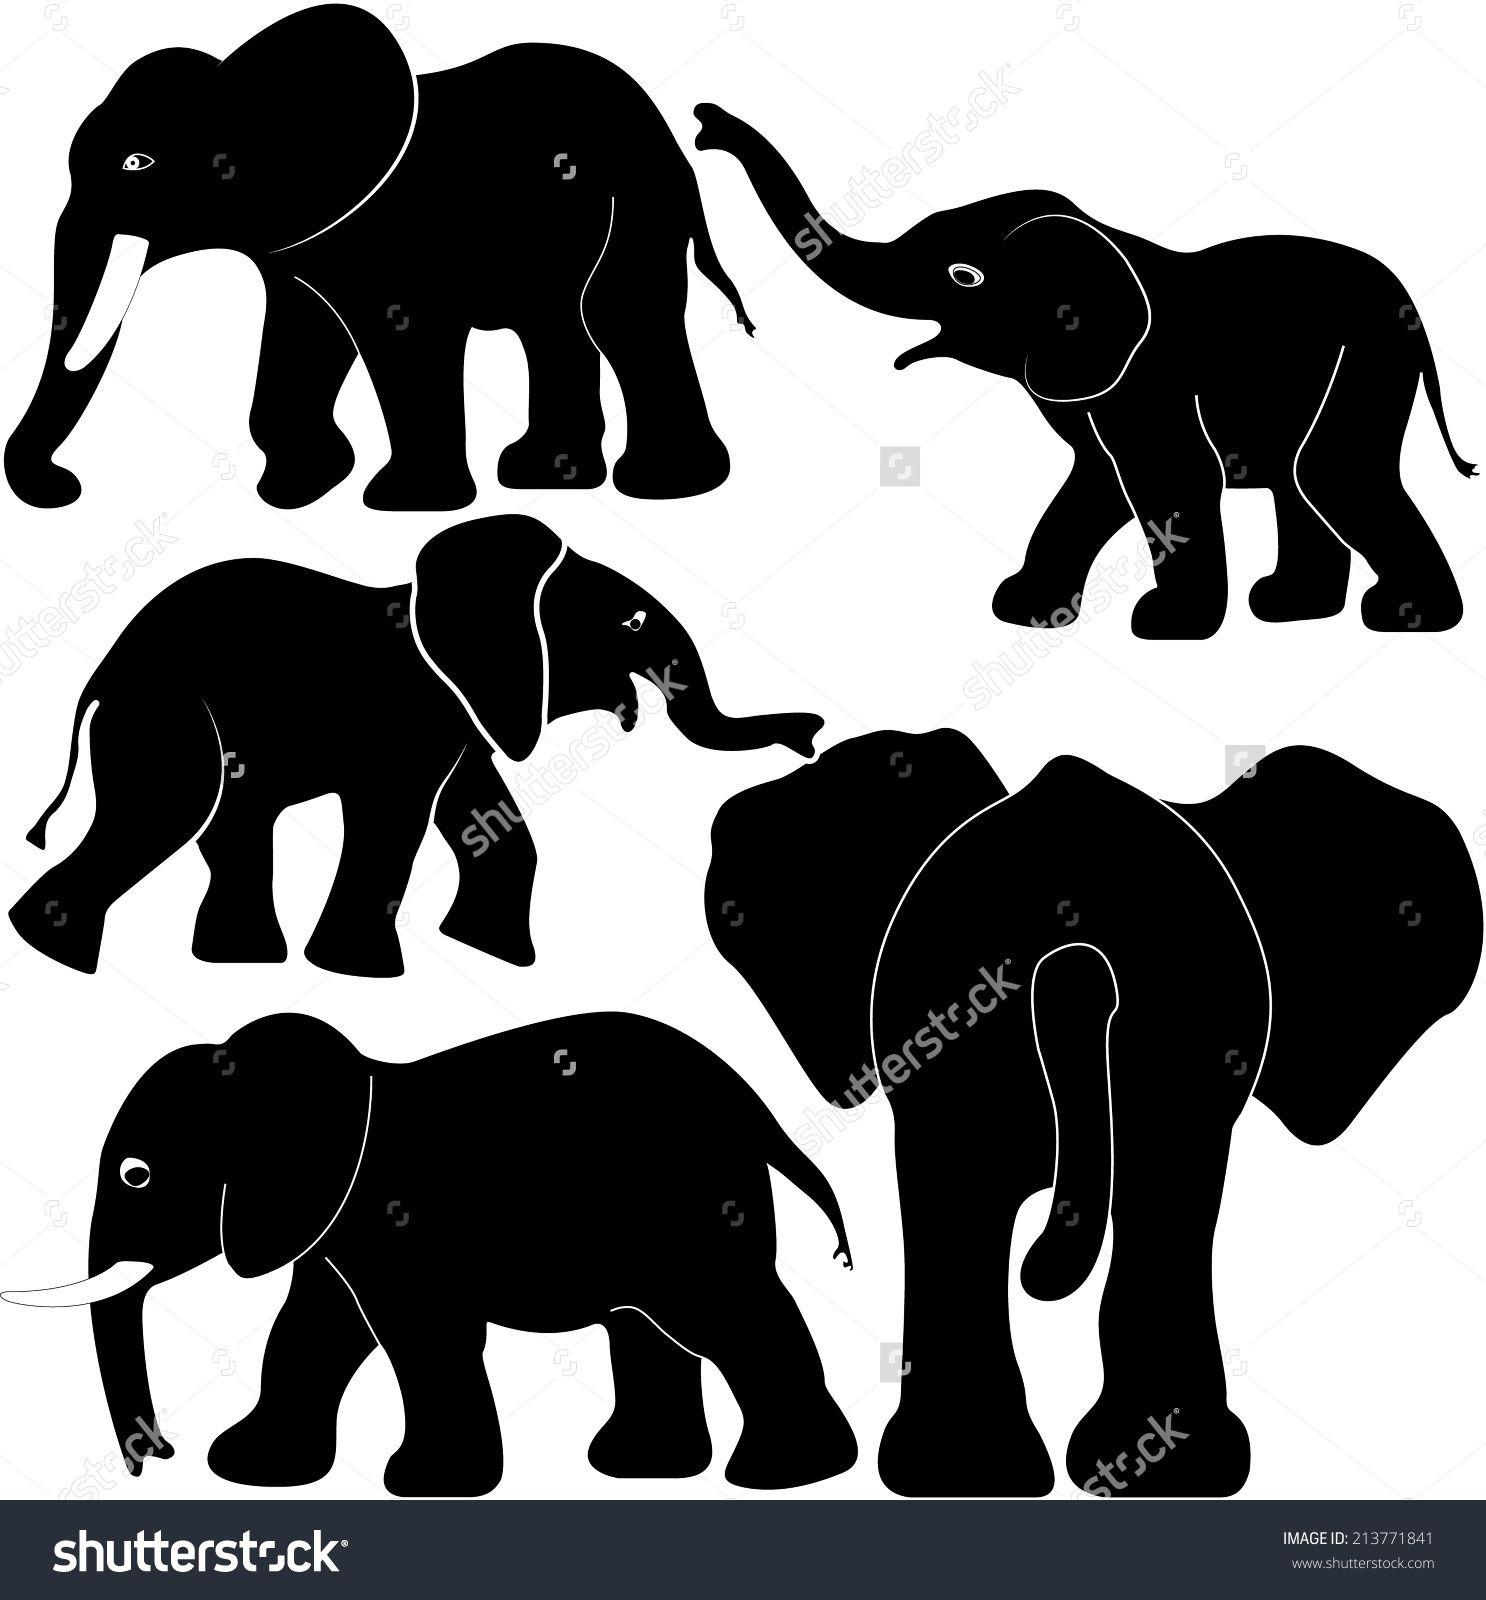 elephant with babies silhouette Google Search Elephant